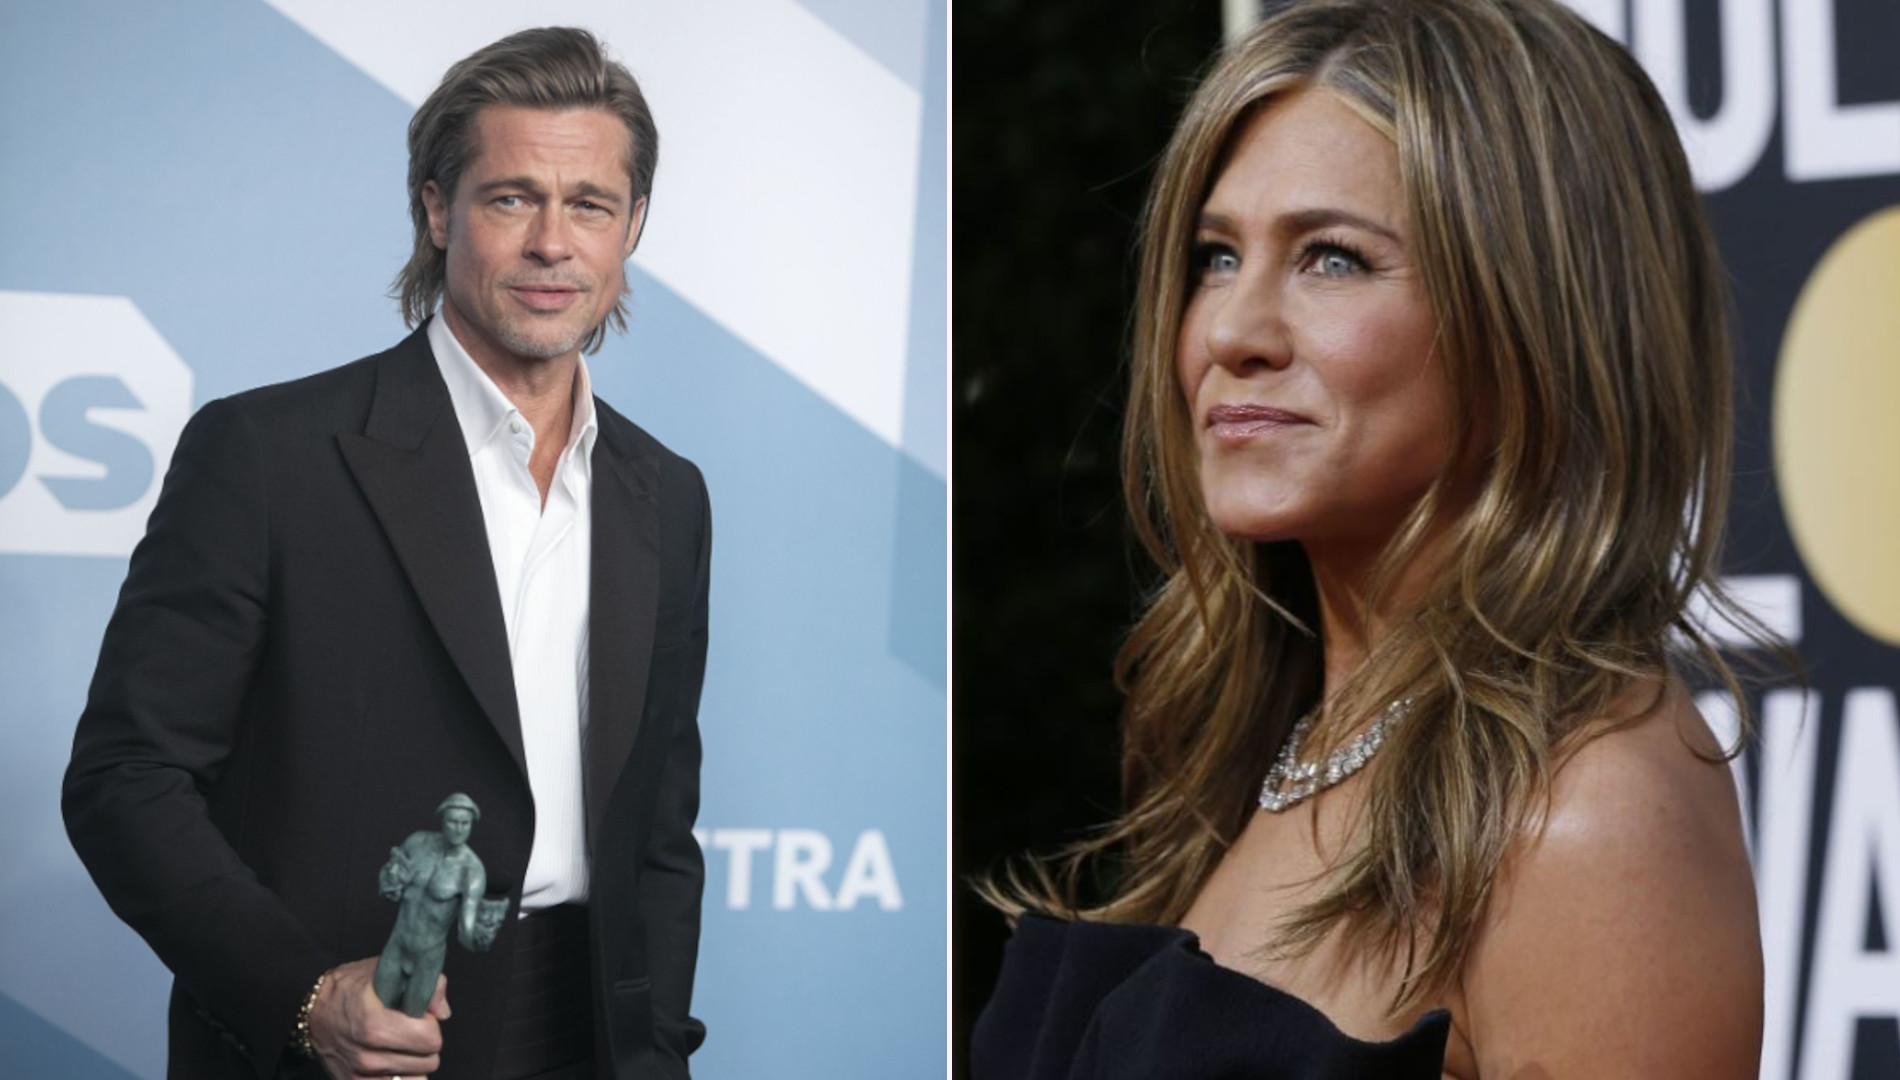 Jennifer Aniston i Brad Pitt RAZEM na gali? To bardzo możliwe